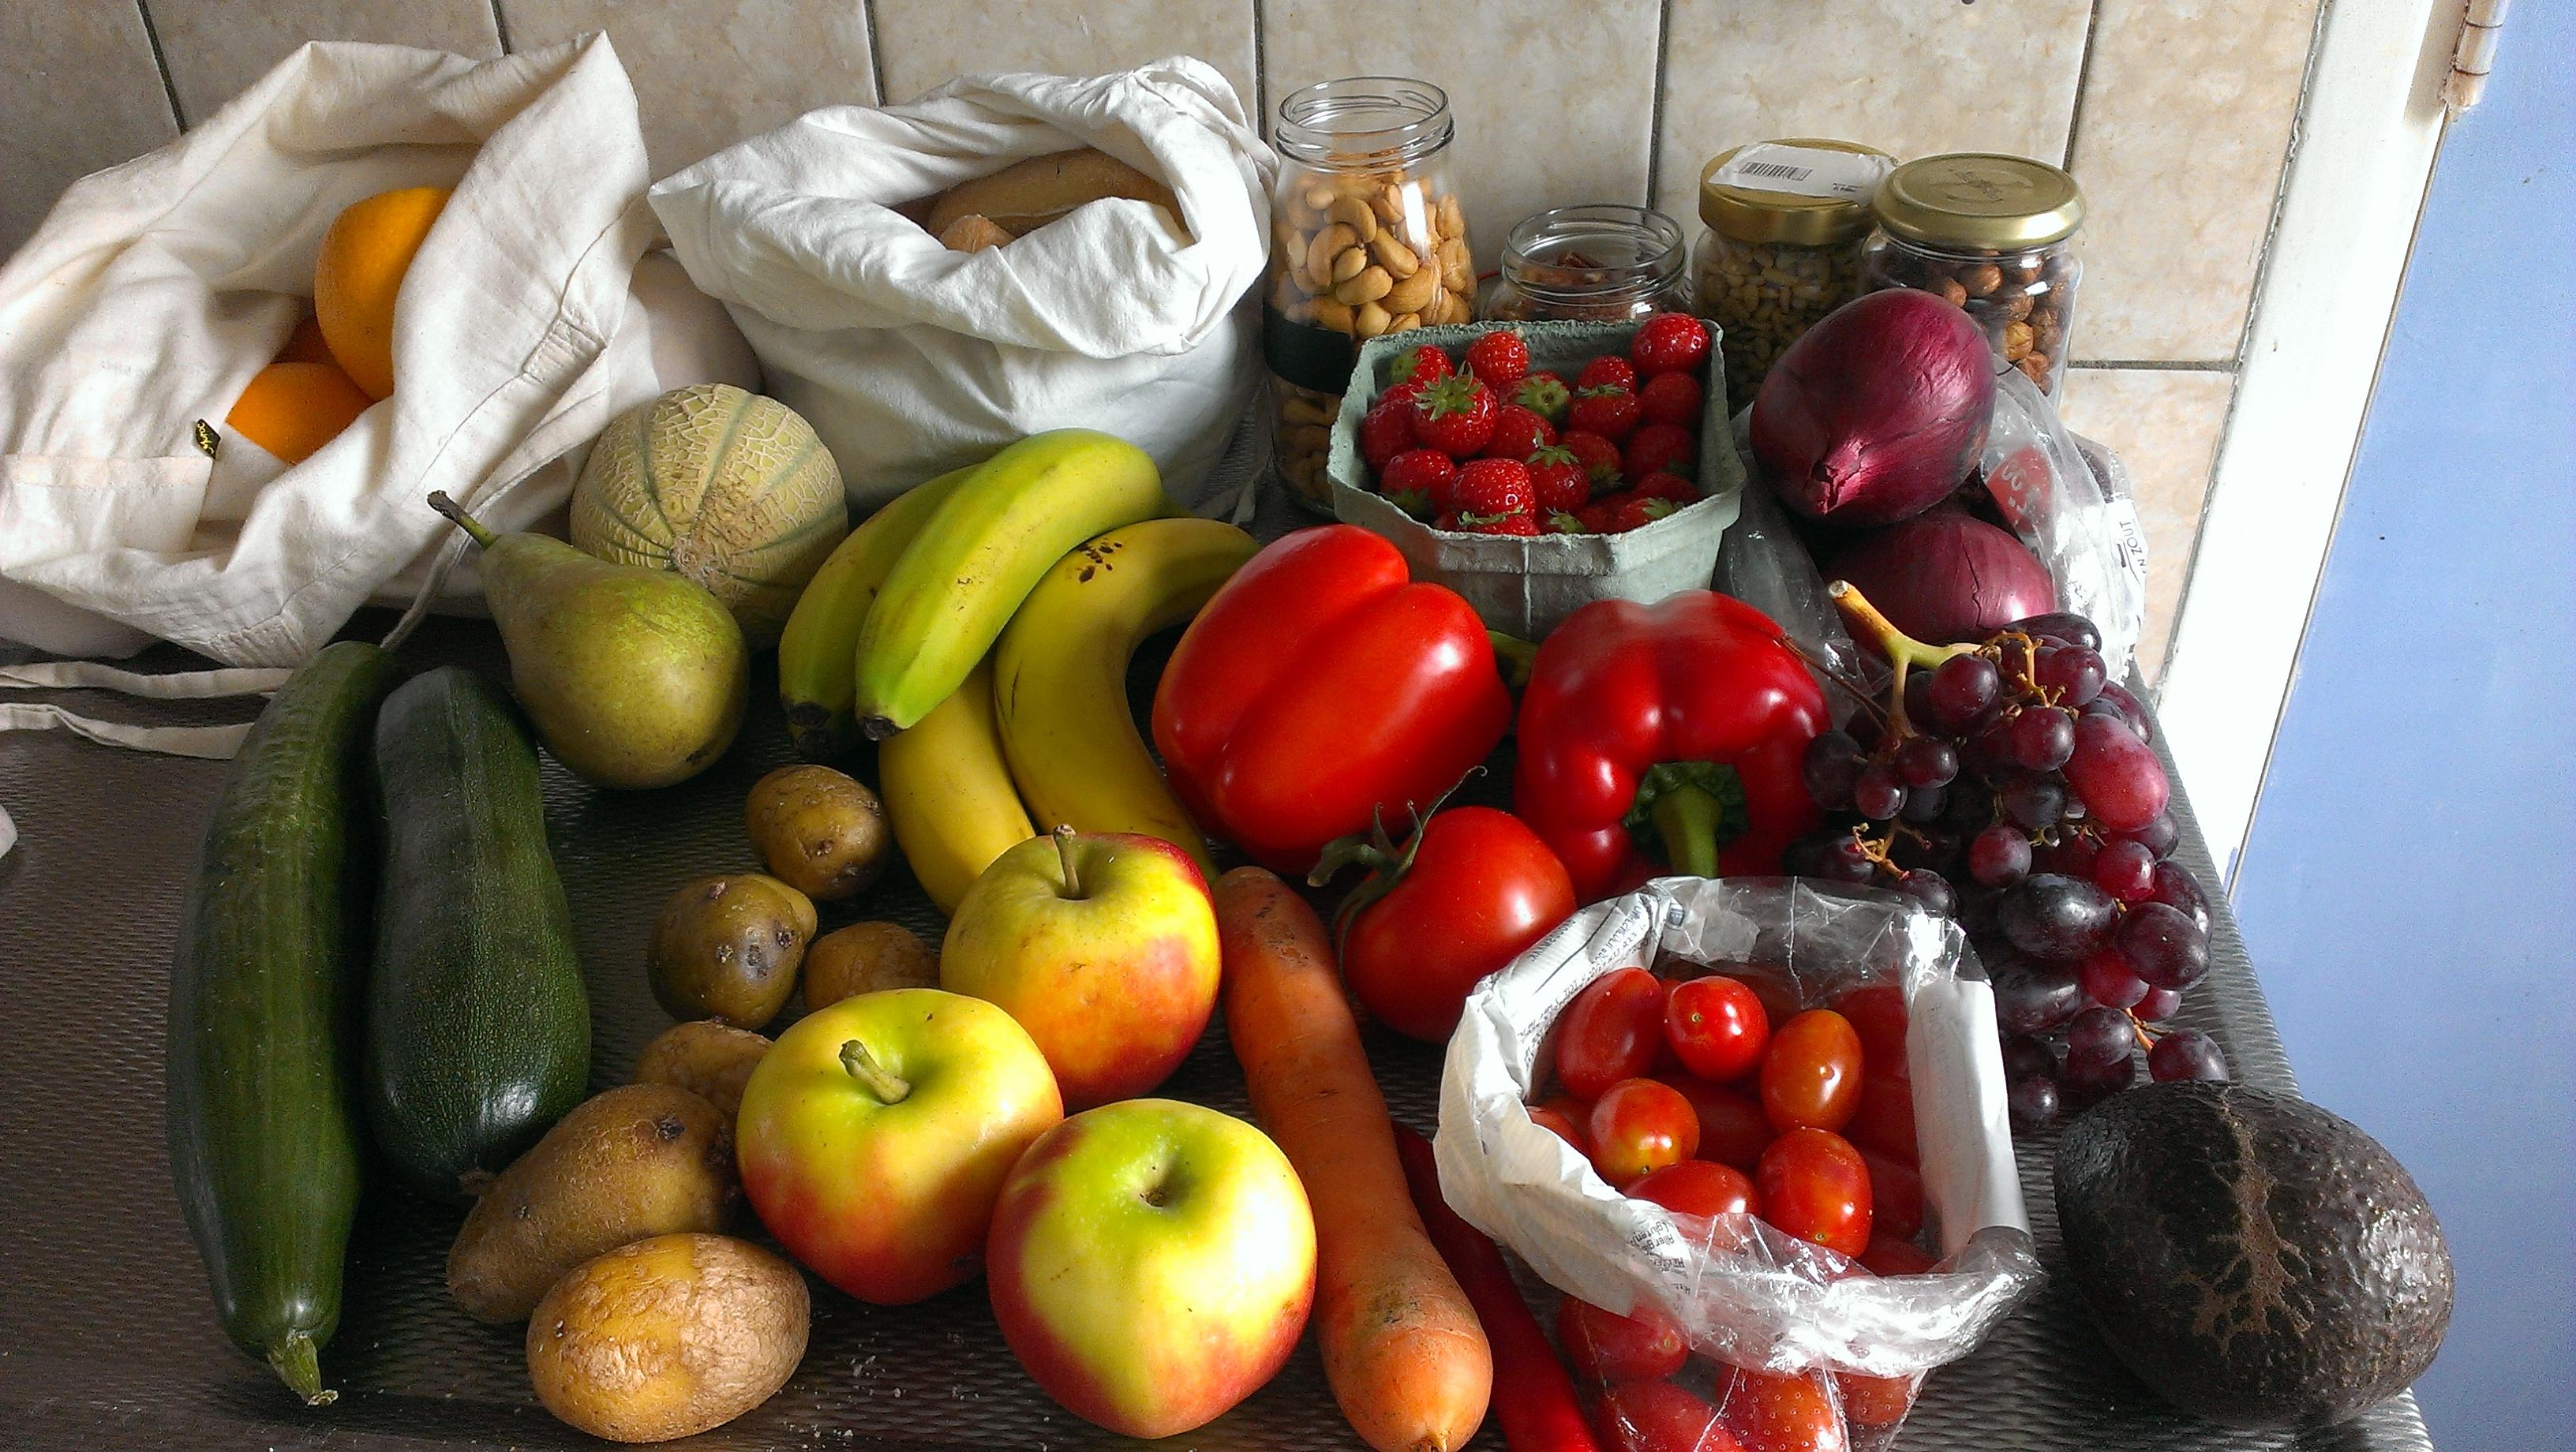 Verpakkingsvrij groente en fruit